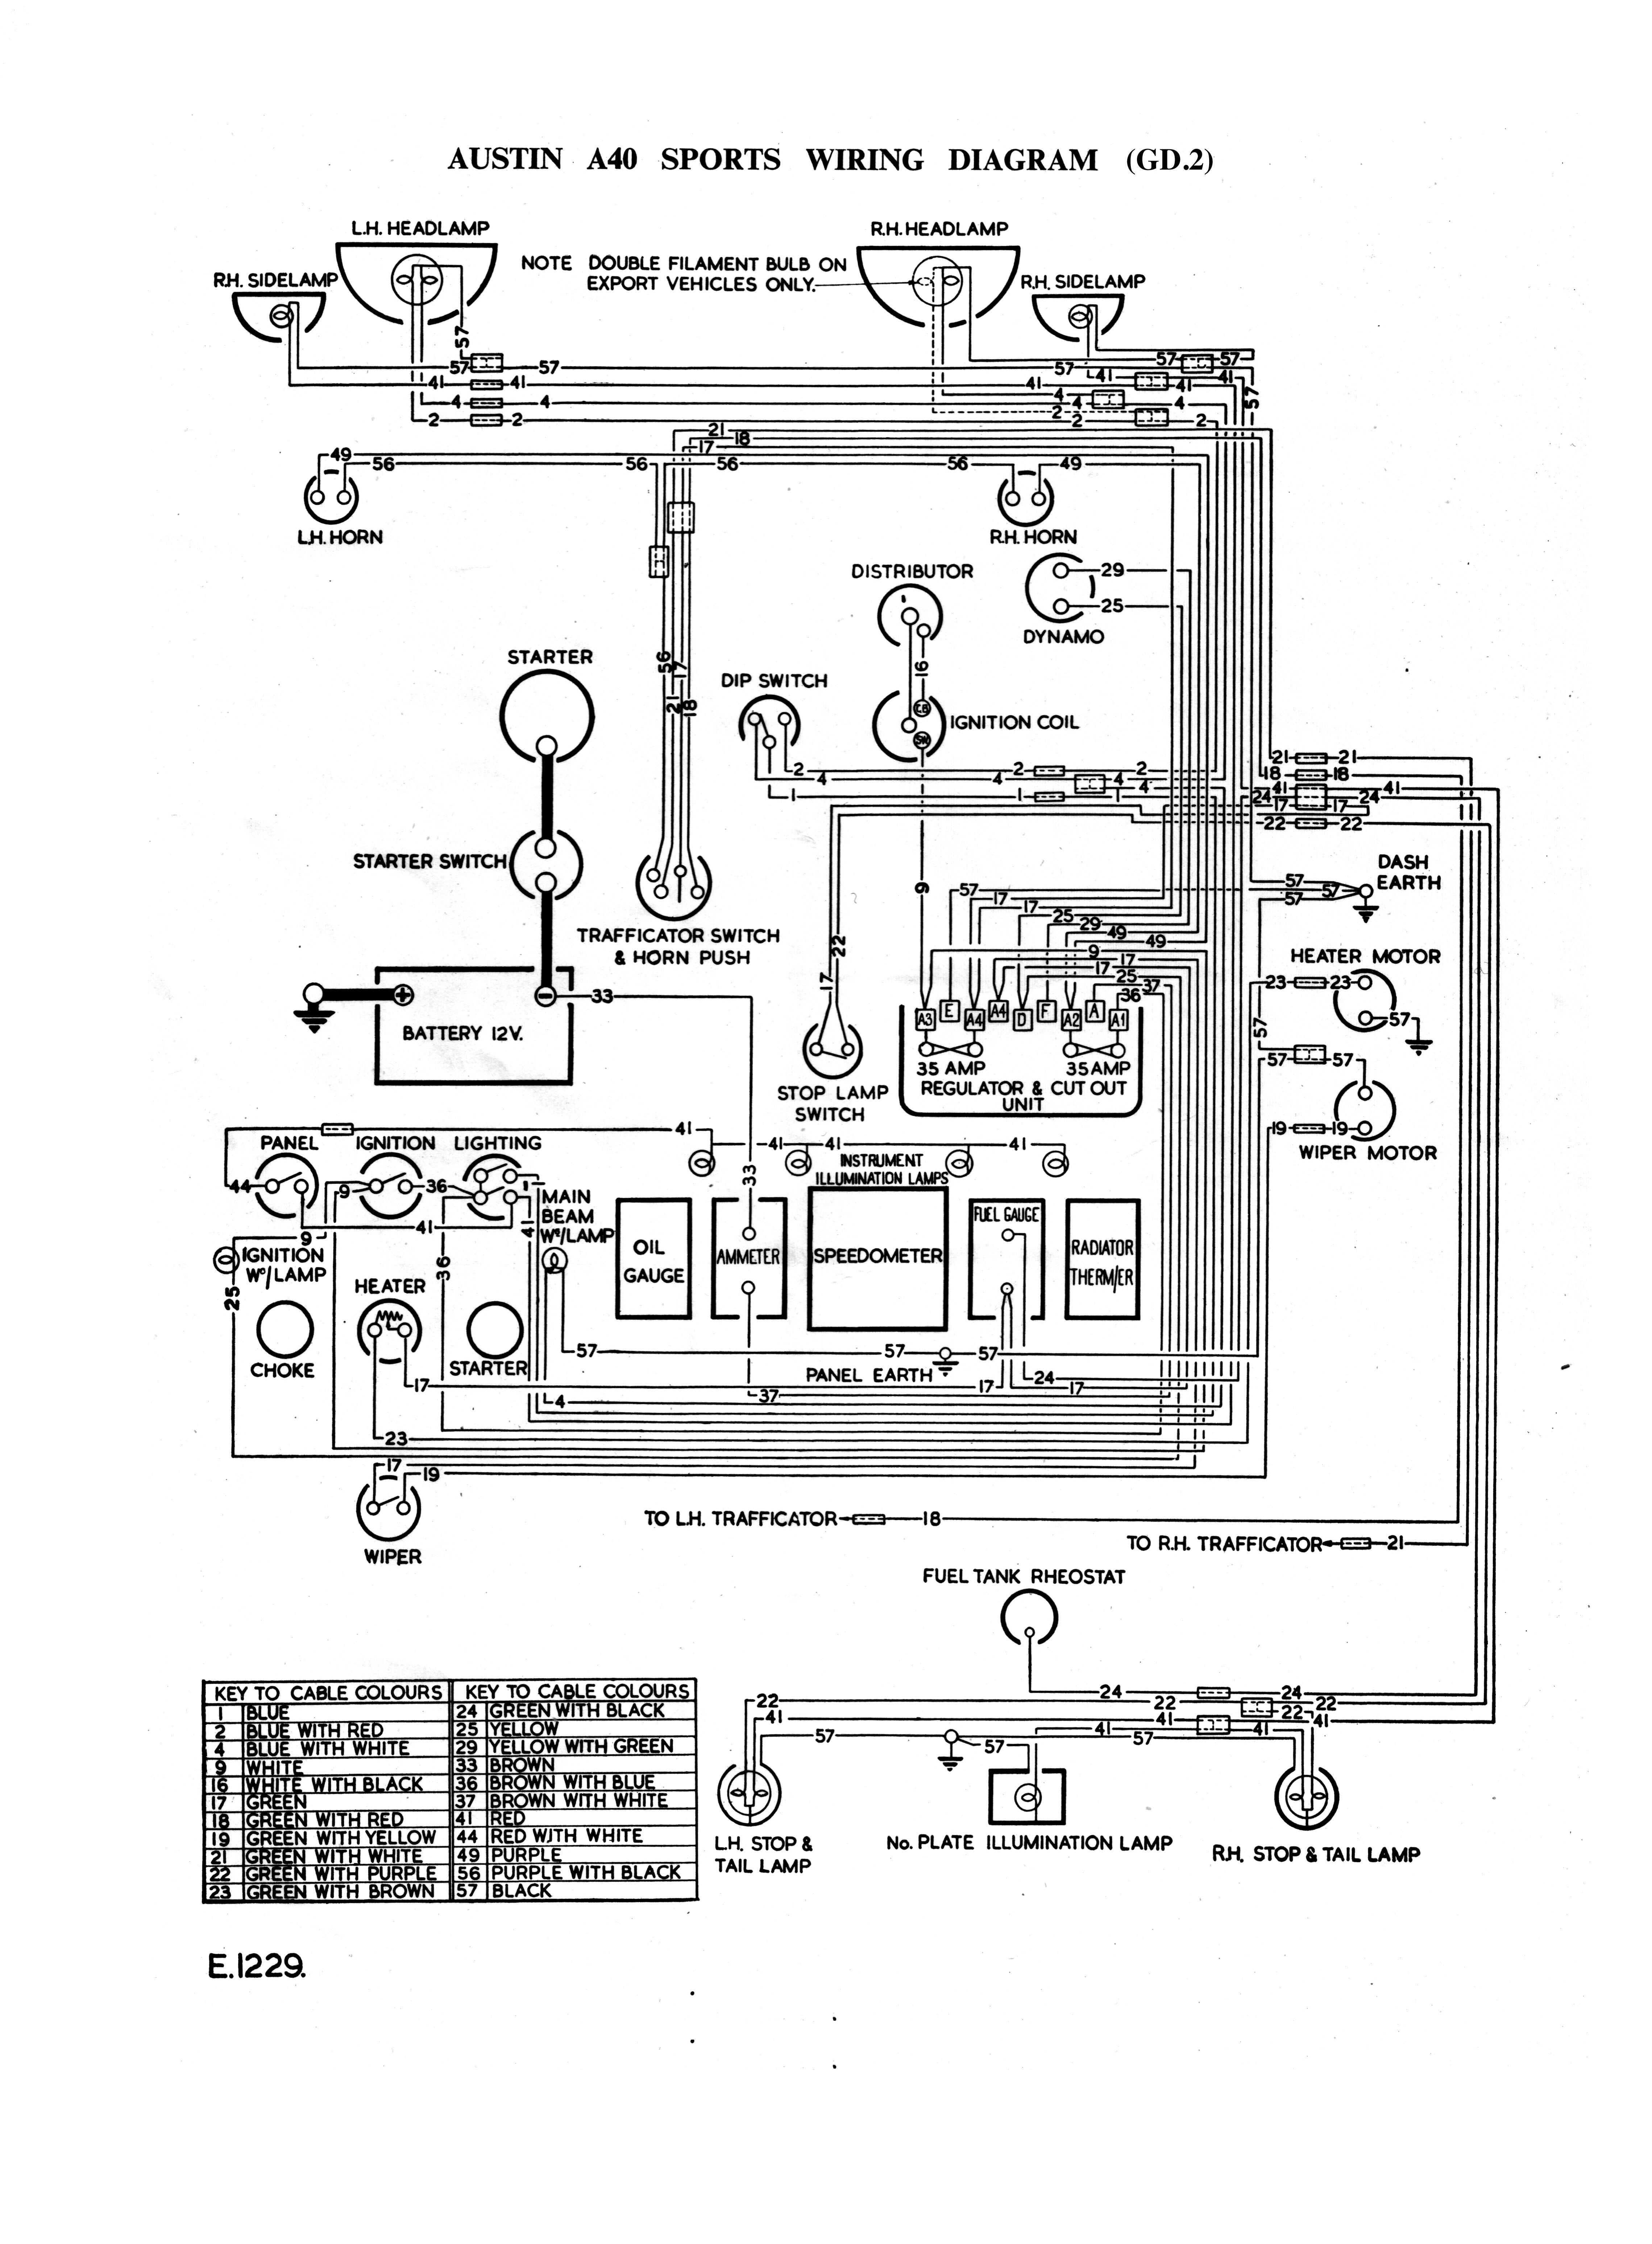 austin a40 sports gd2 wiring diagram [ 4558 x 6192 Pixel ]